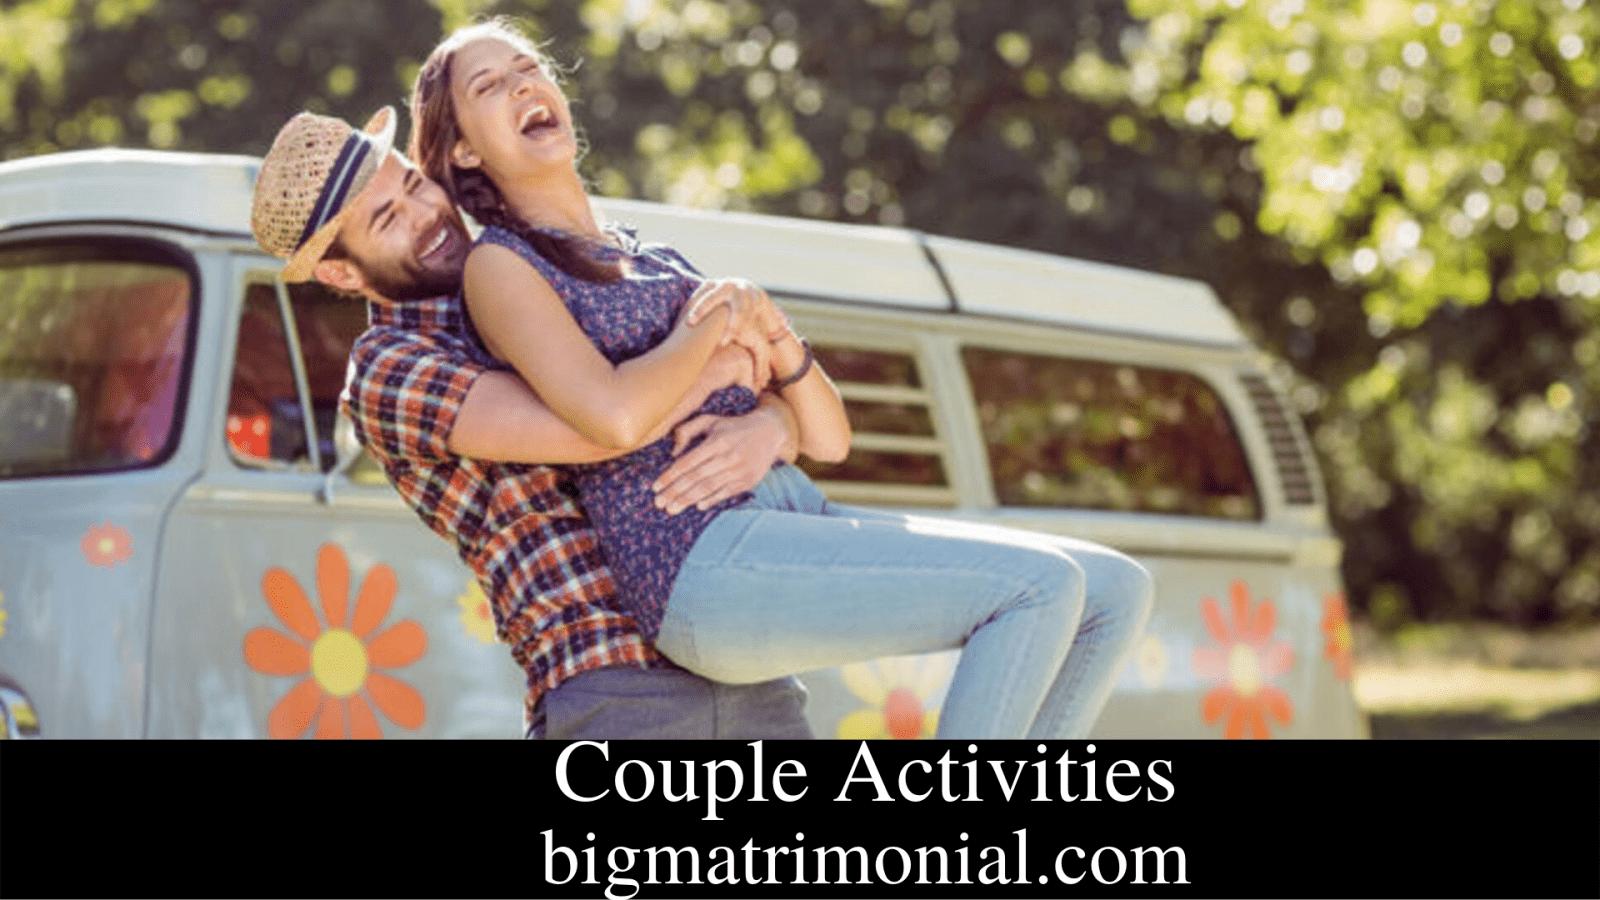 Couple Activities